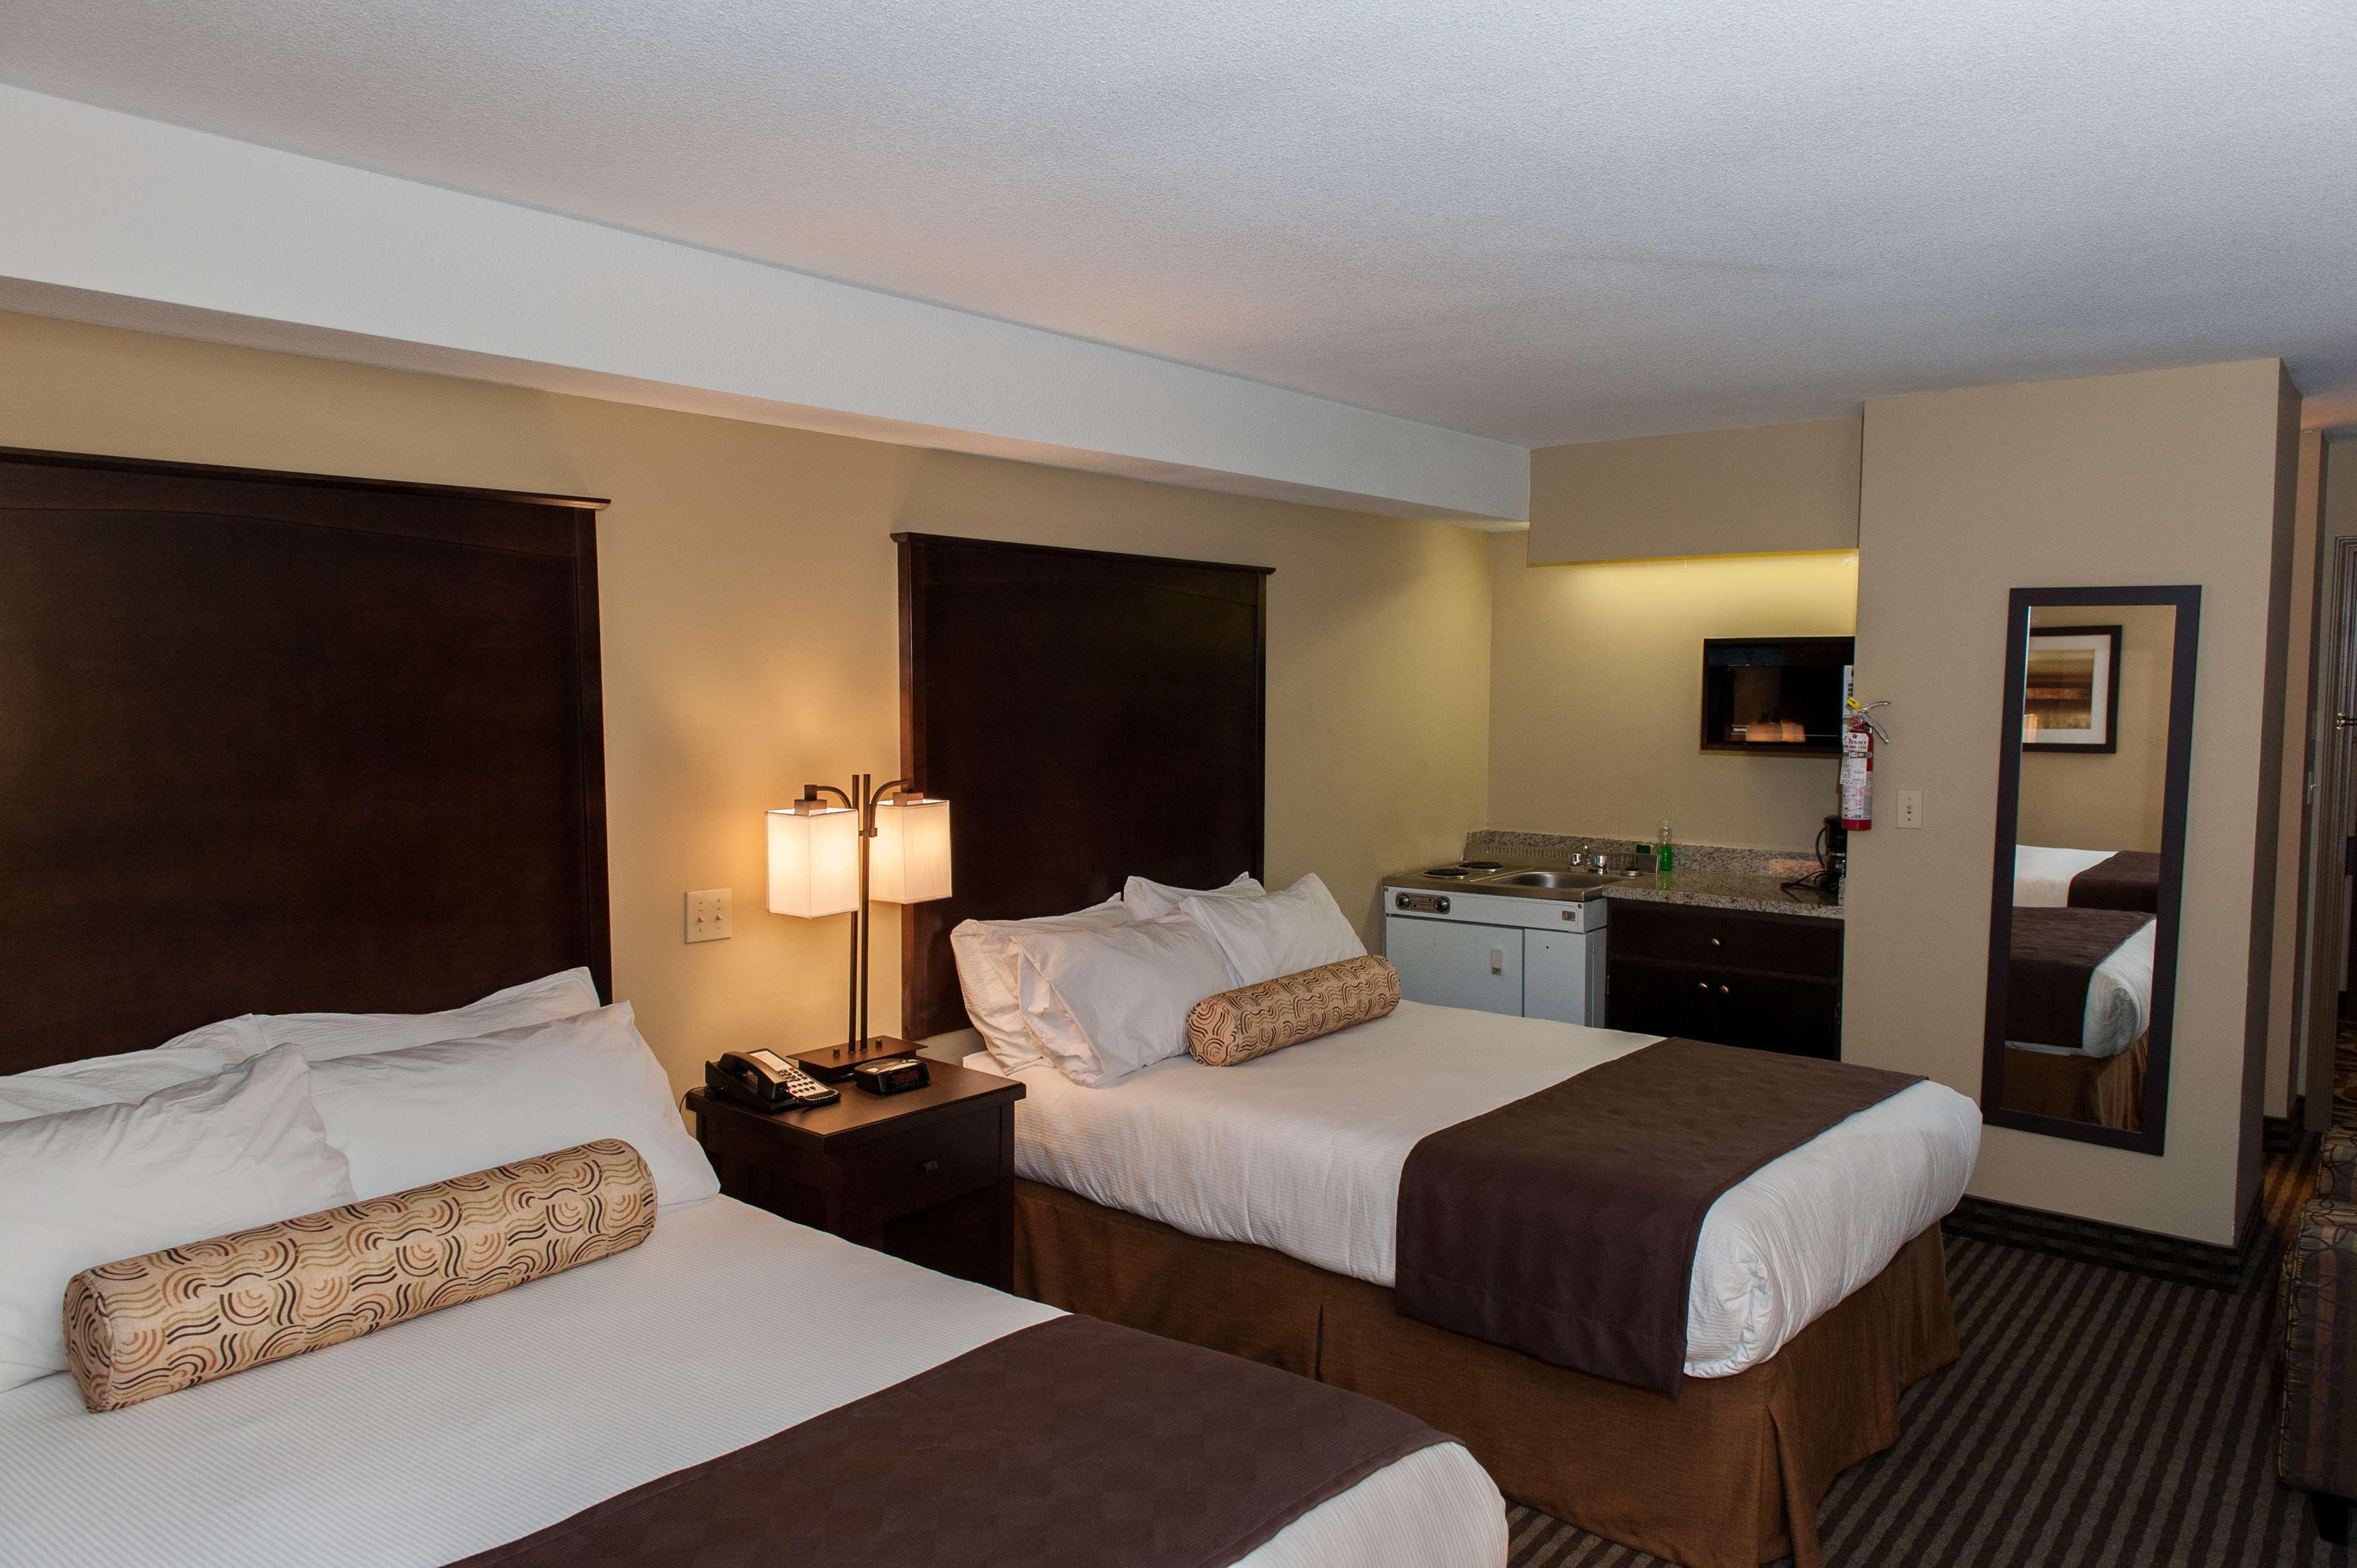 Best Western Maple Ridge Hotel in Maple Ridge: Double Bedded Room with Kitchenette